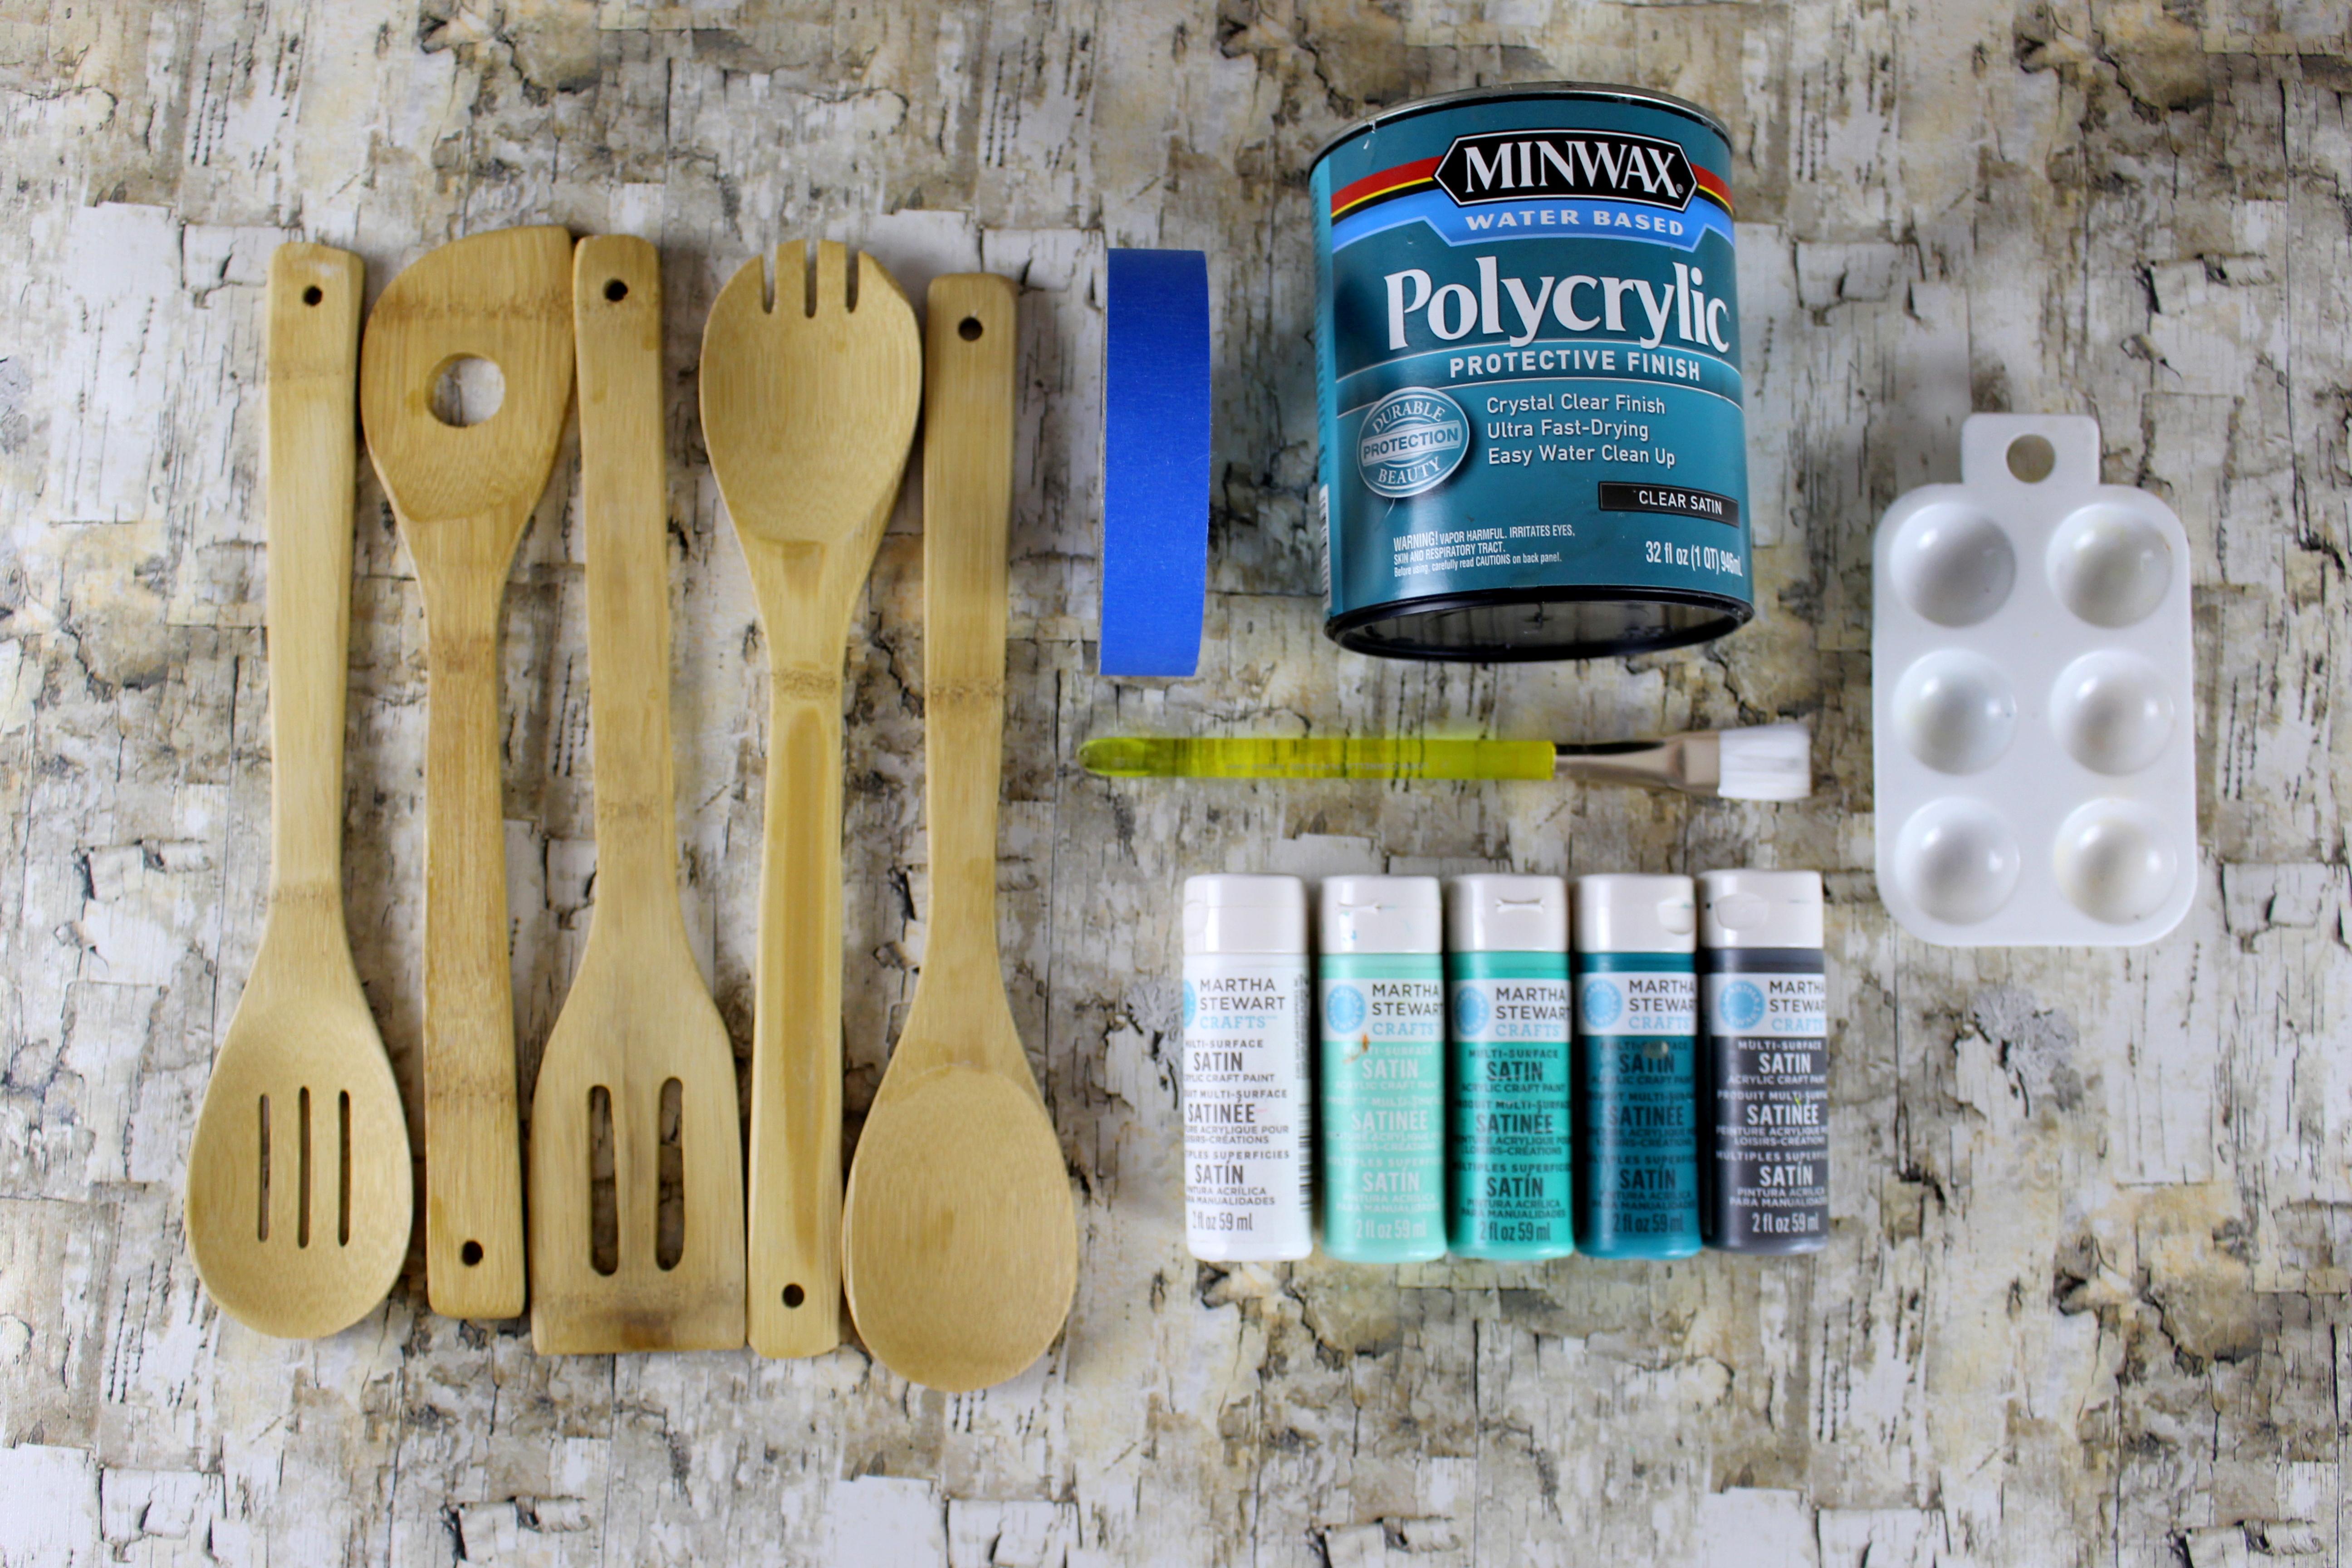 Materials-needed-to-paint-kitchen-utensils